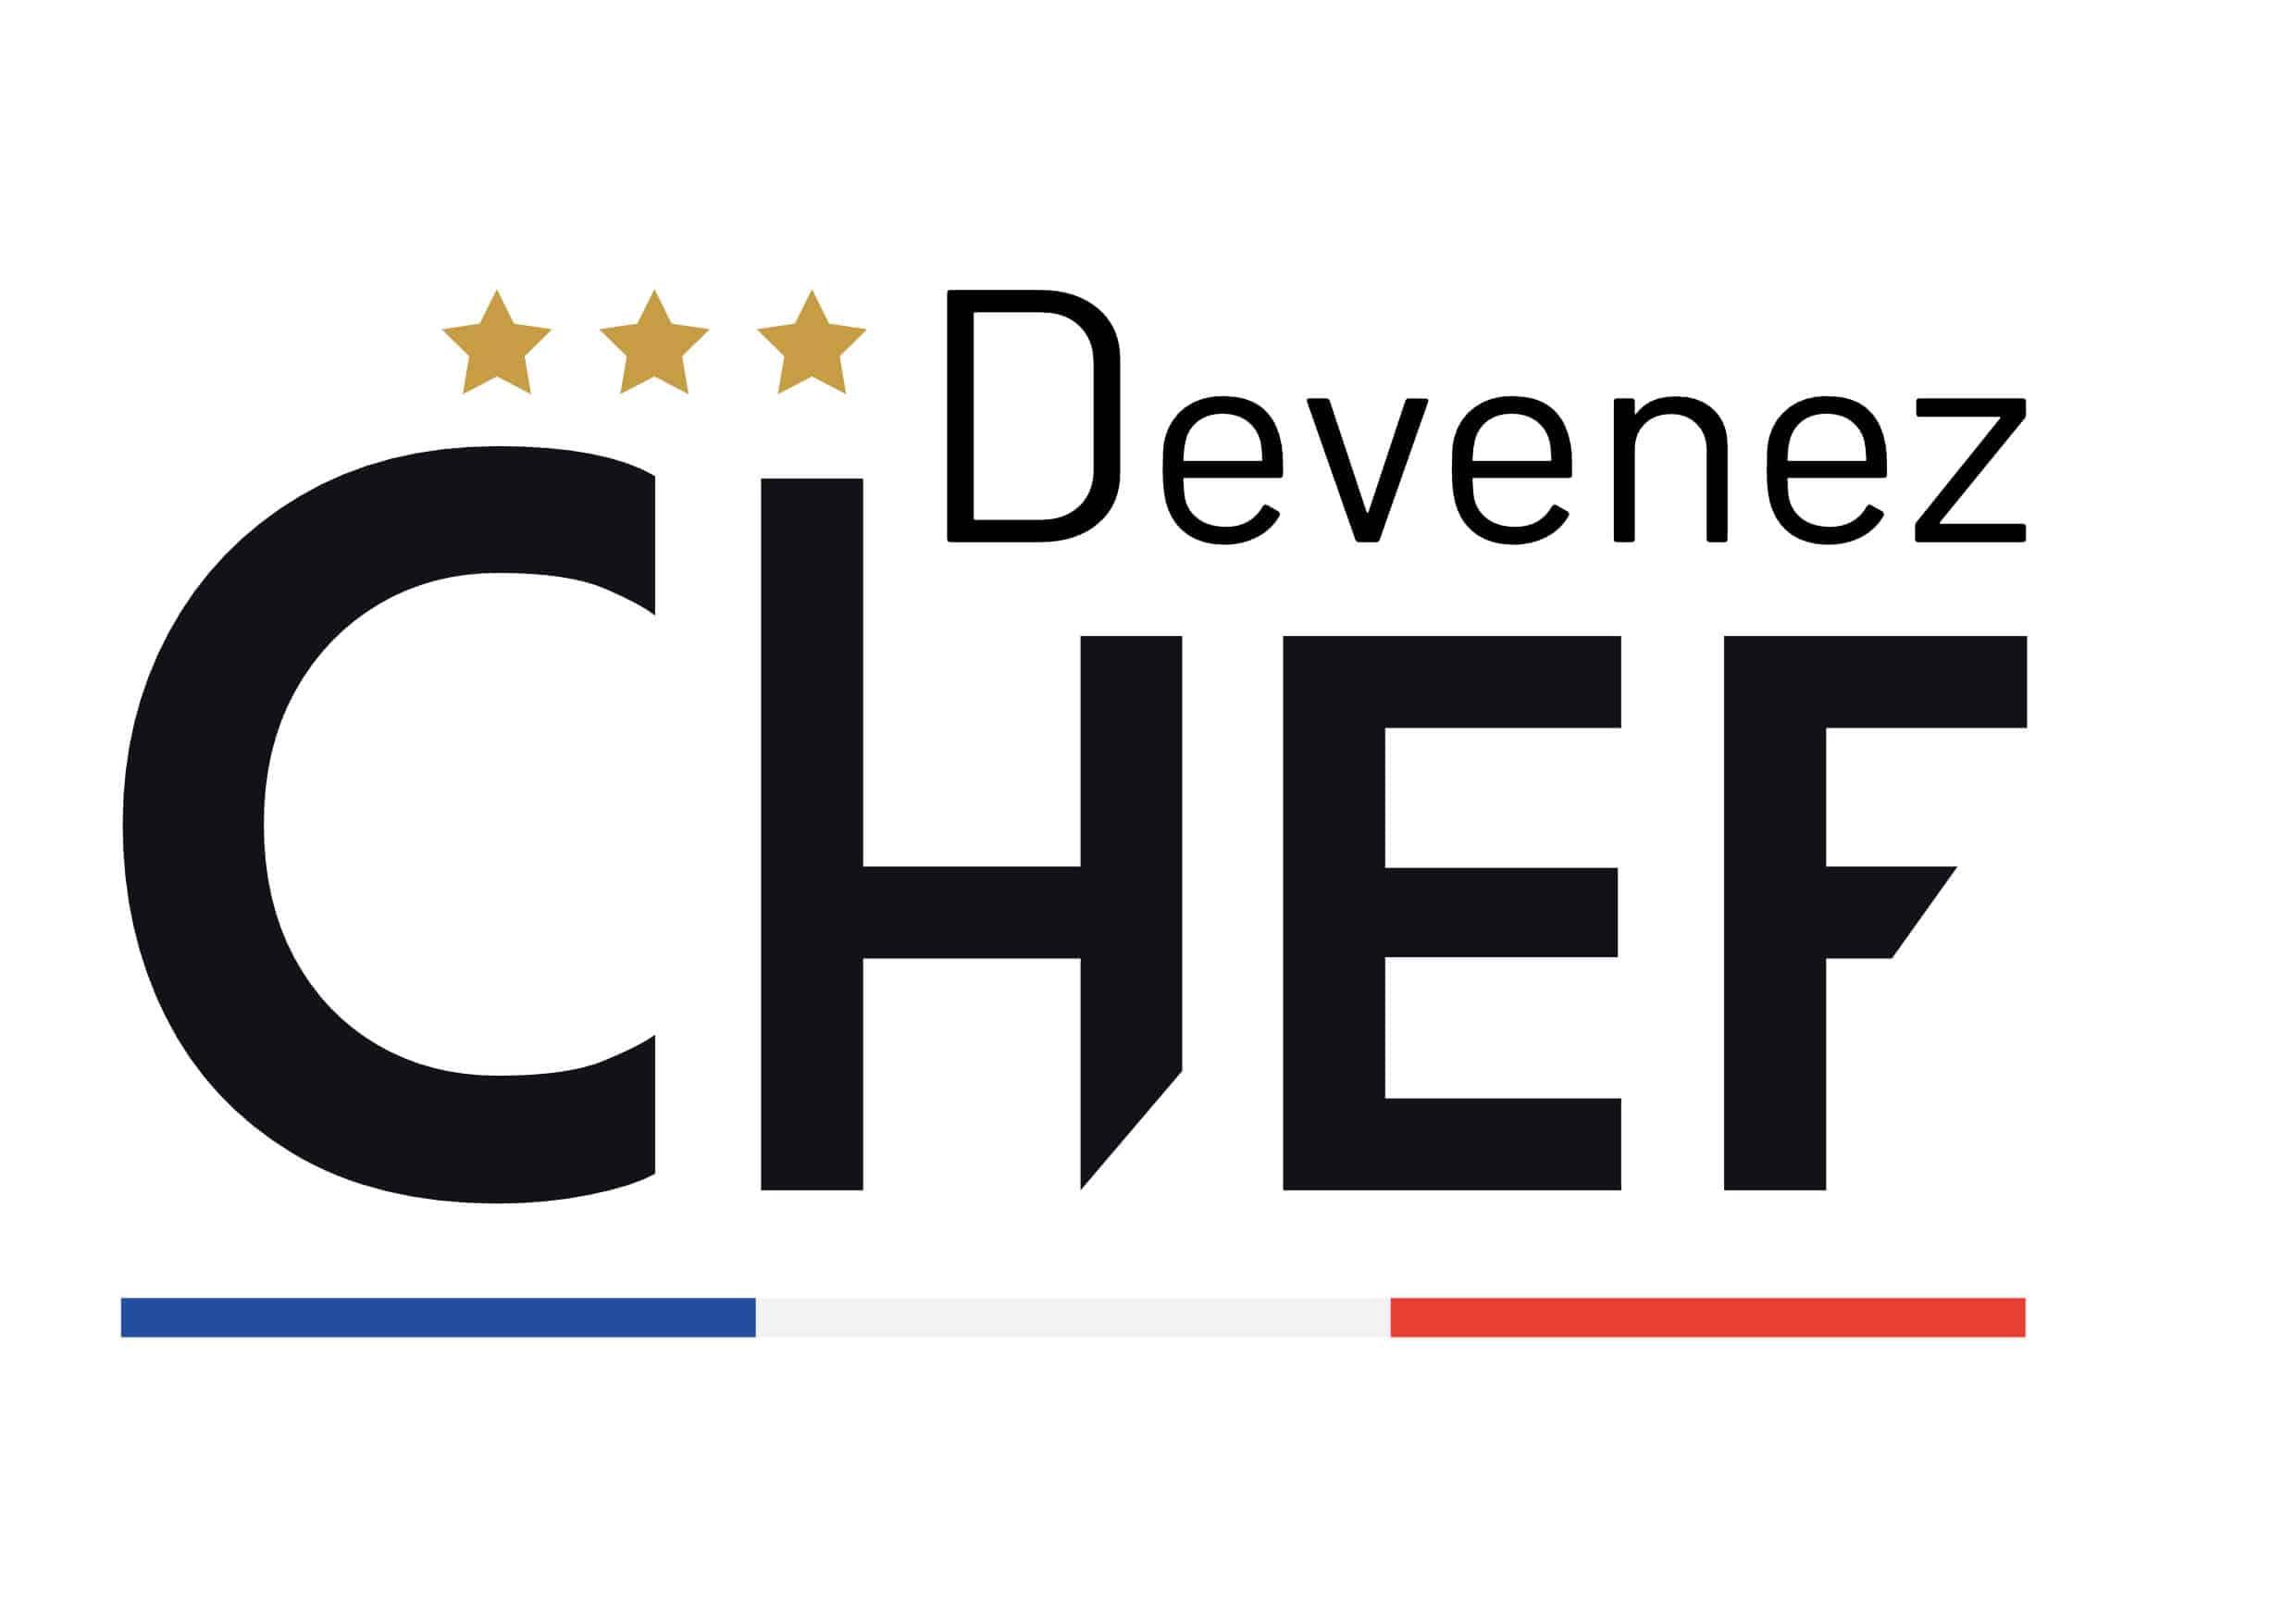 Devenez chef Logo Wacano